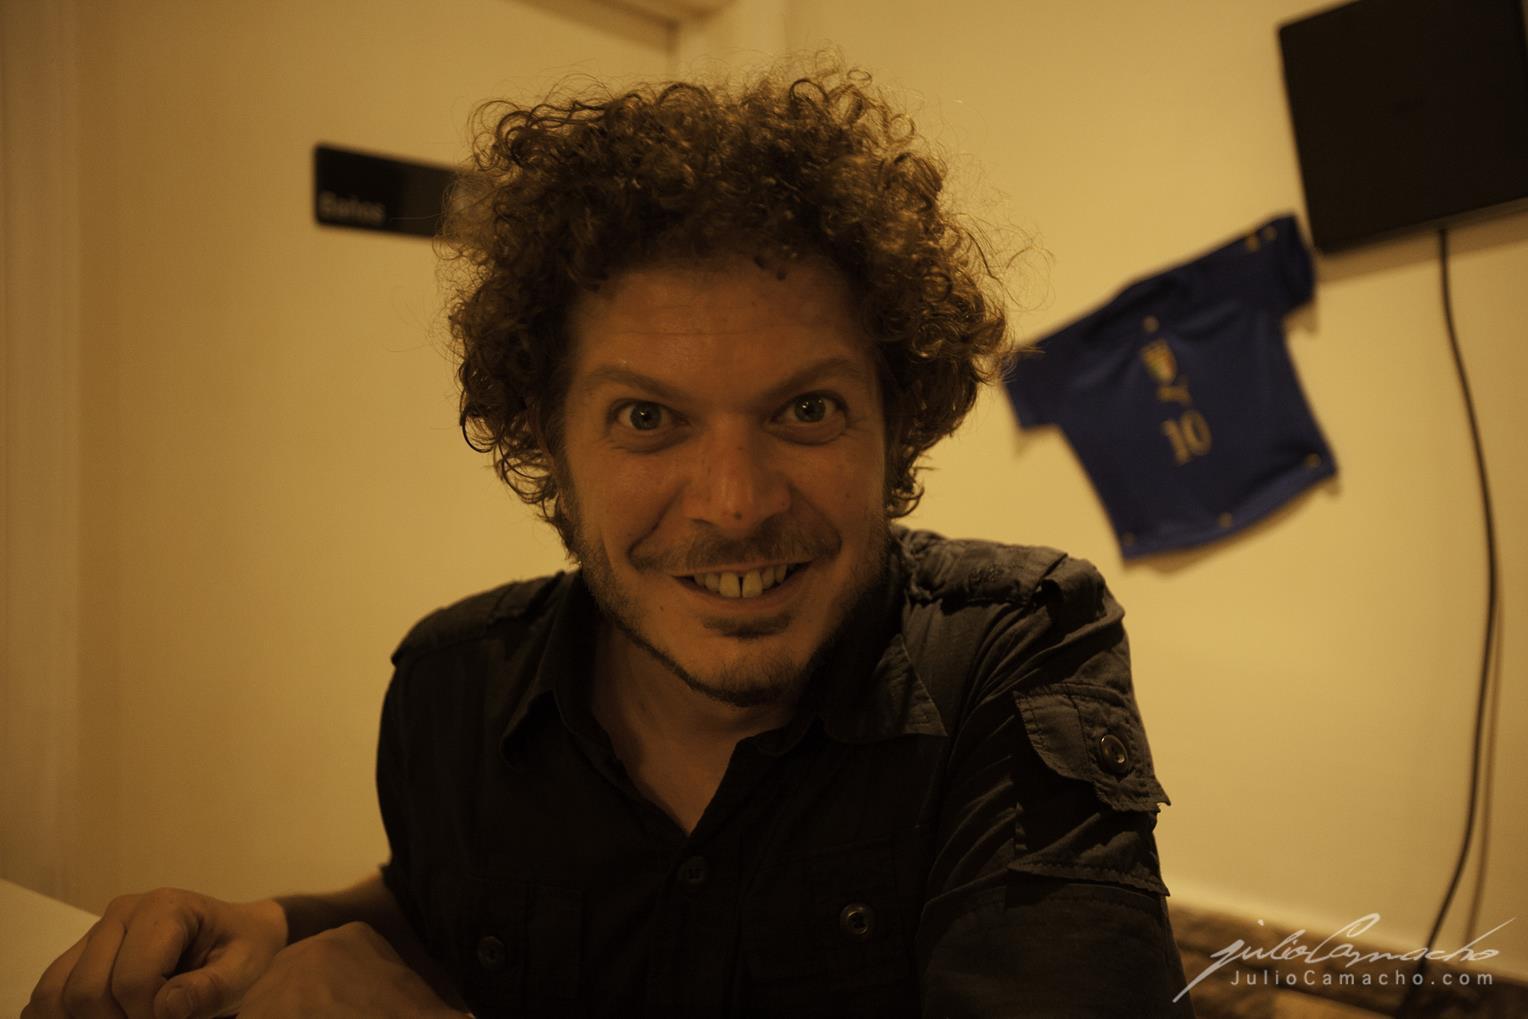 2014-10-30 31 CAST TOUR Ensenada y Tijuana - 1340 - www.Juli (Copy).jpg